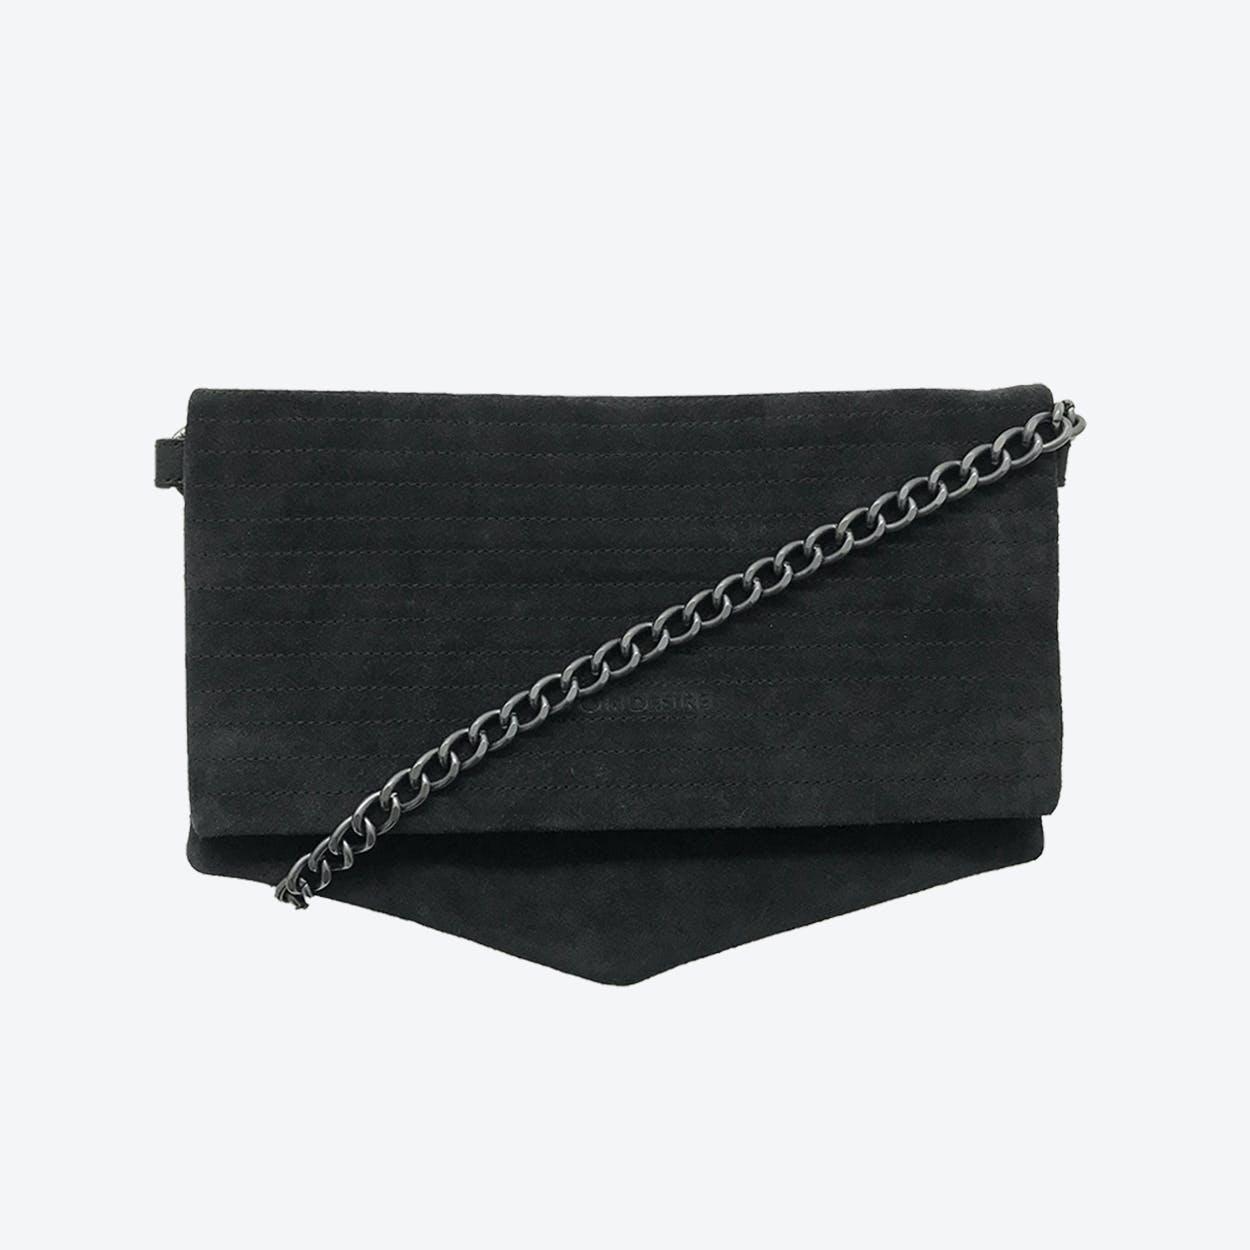 ND Folded Big Pinstripe #4 - 3-in-1 Suede Bag